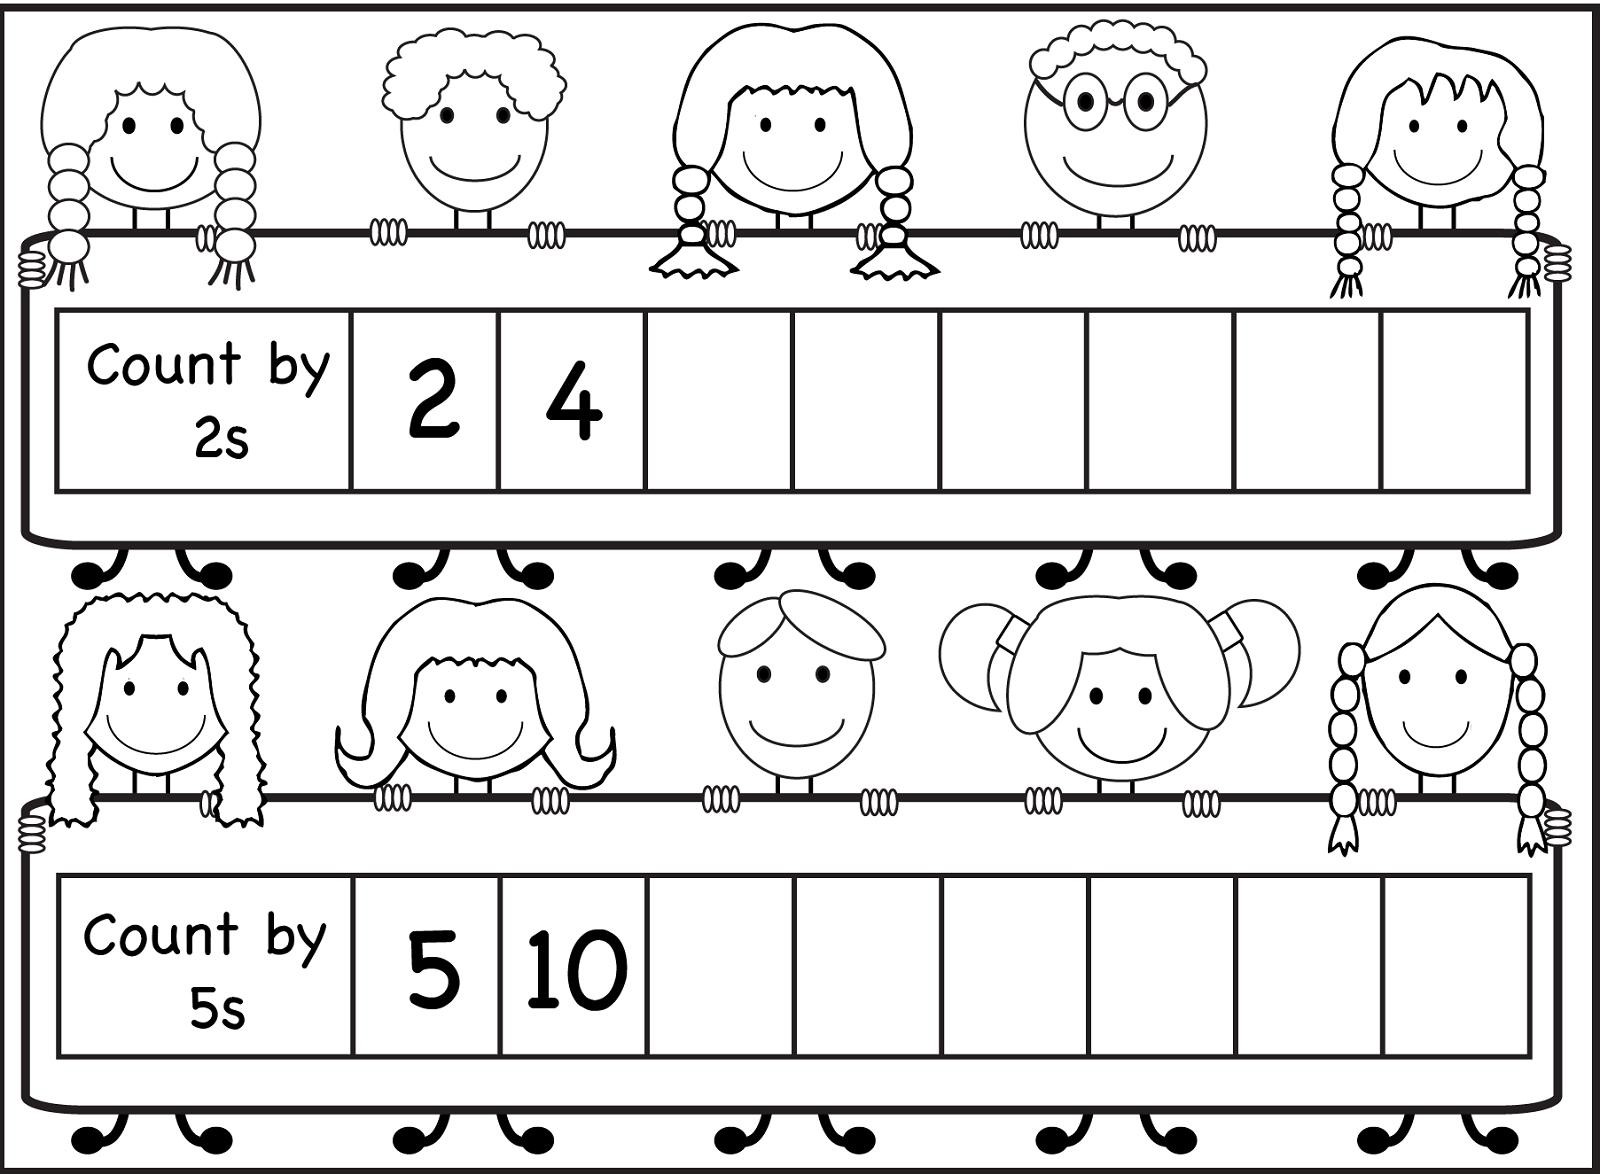 Skip Count By 5 Worksheet 2016